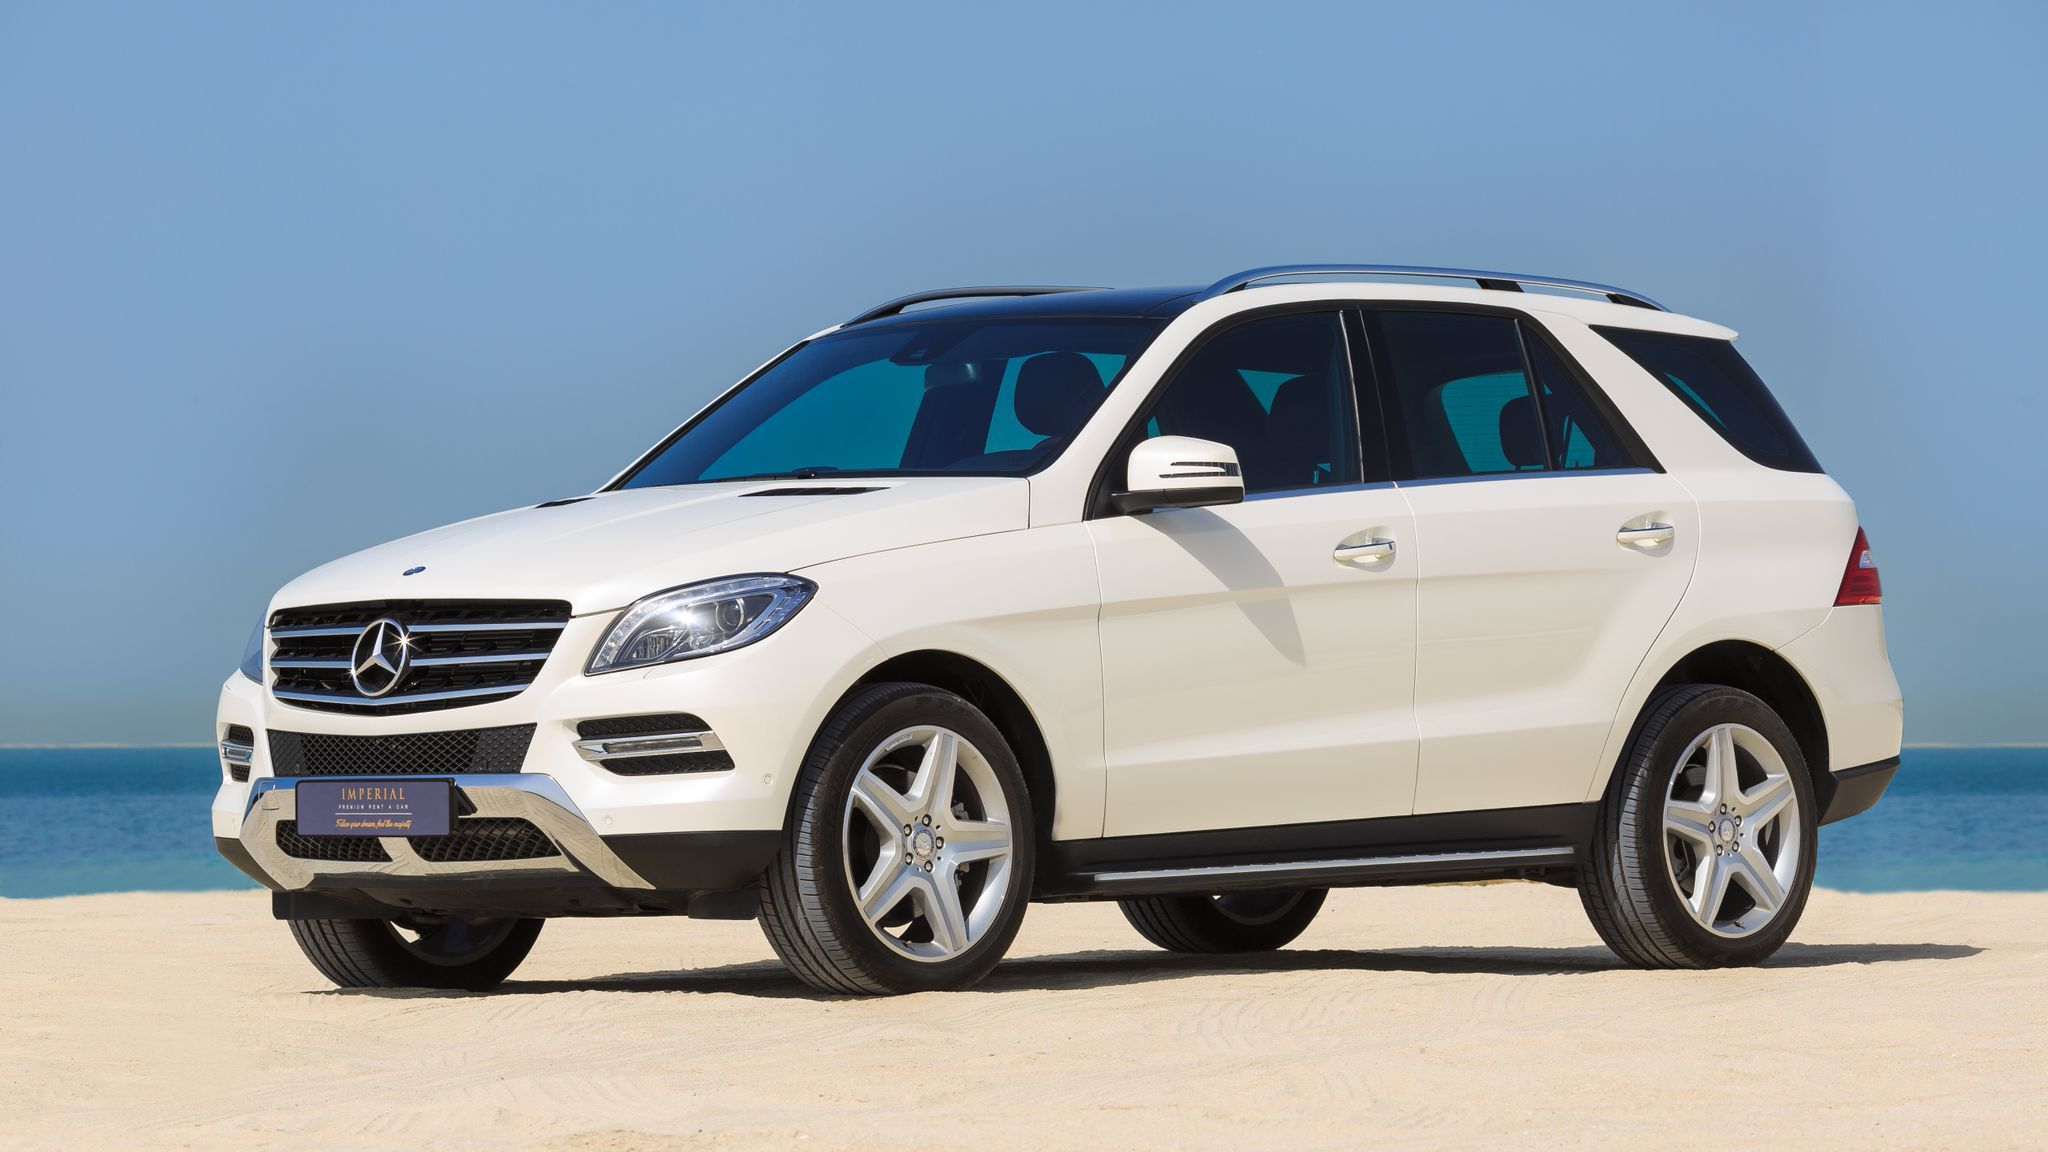 Pin By Imperial Premium Rent A Car On Our Fleet Benz S Class Mercedes Mercedes Benz